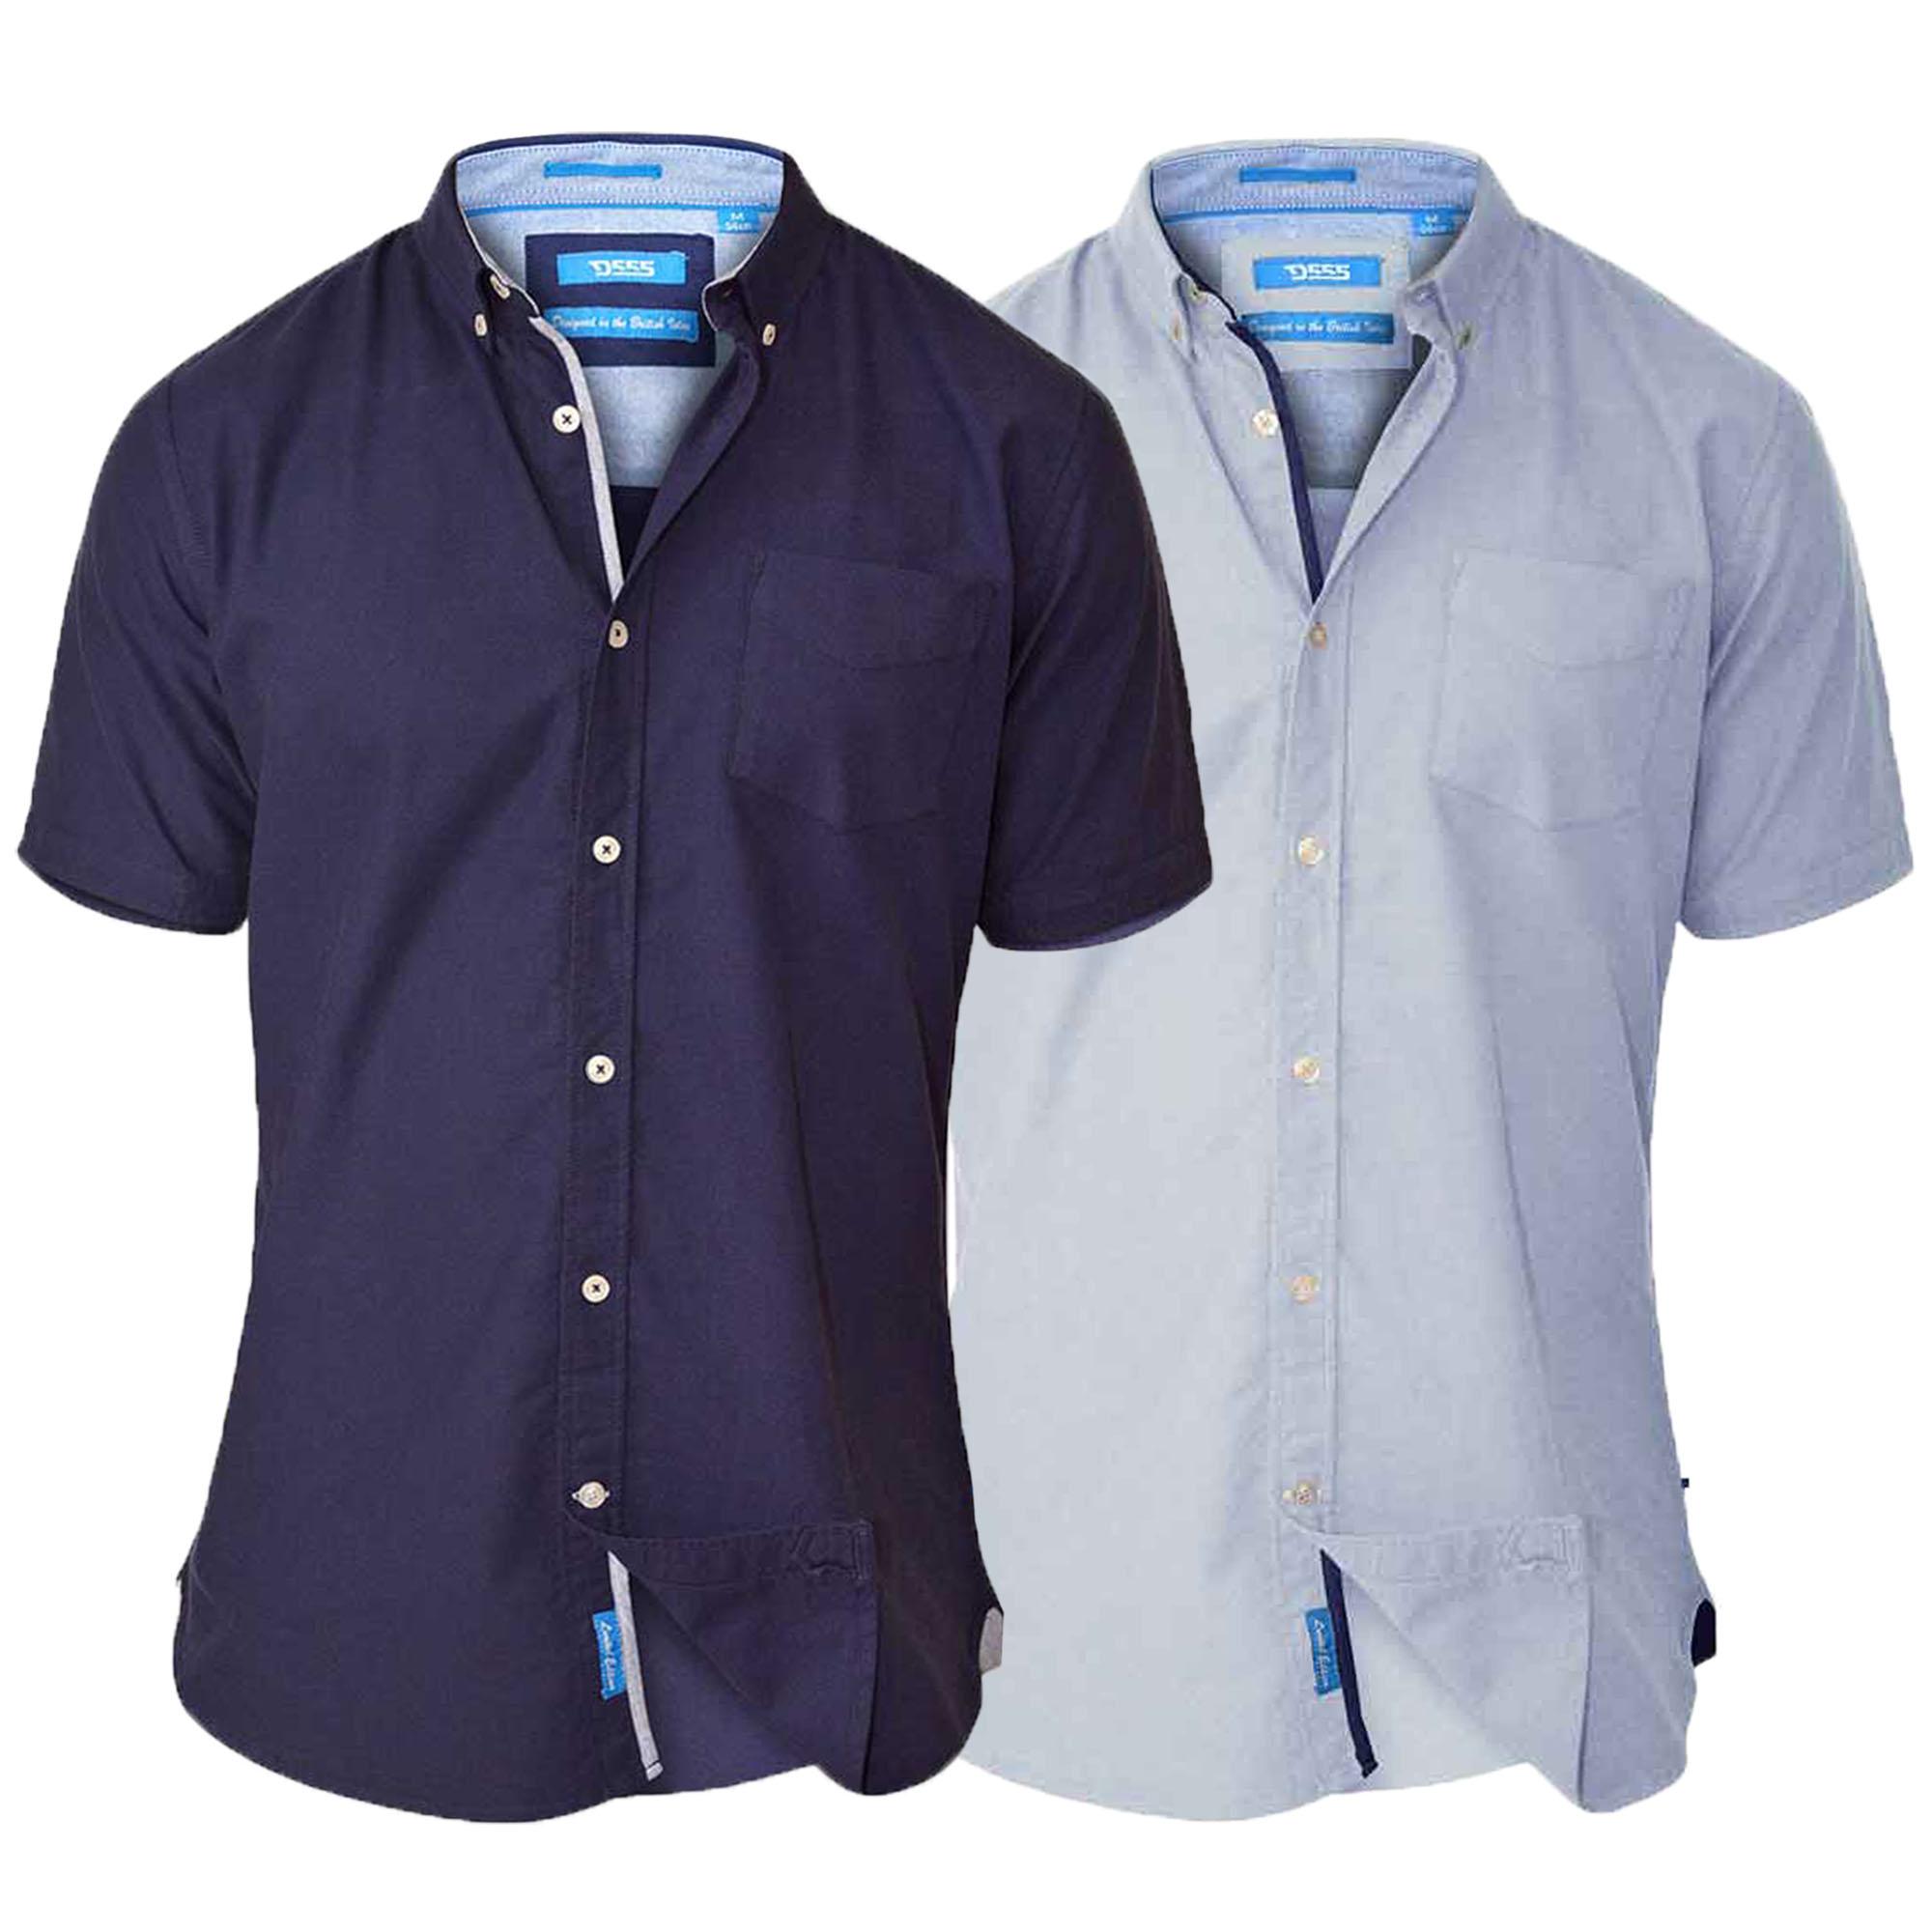 Mens Cotton Chambray Shirt D555 Duke Short Sleeved Big King Size